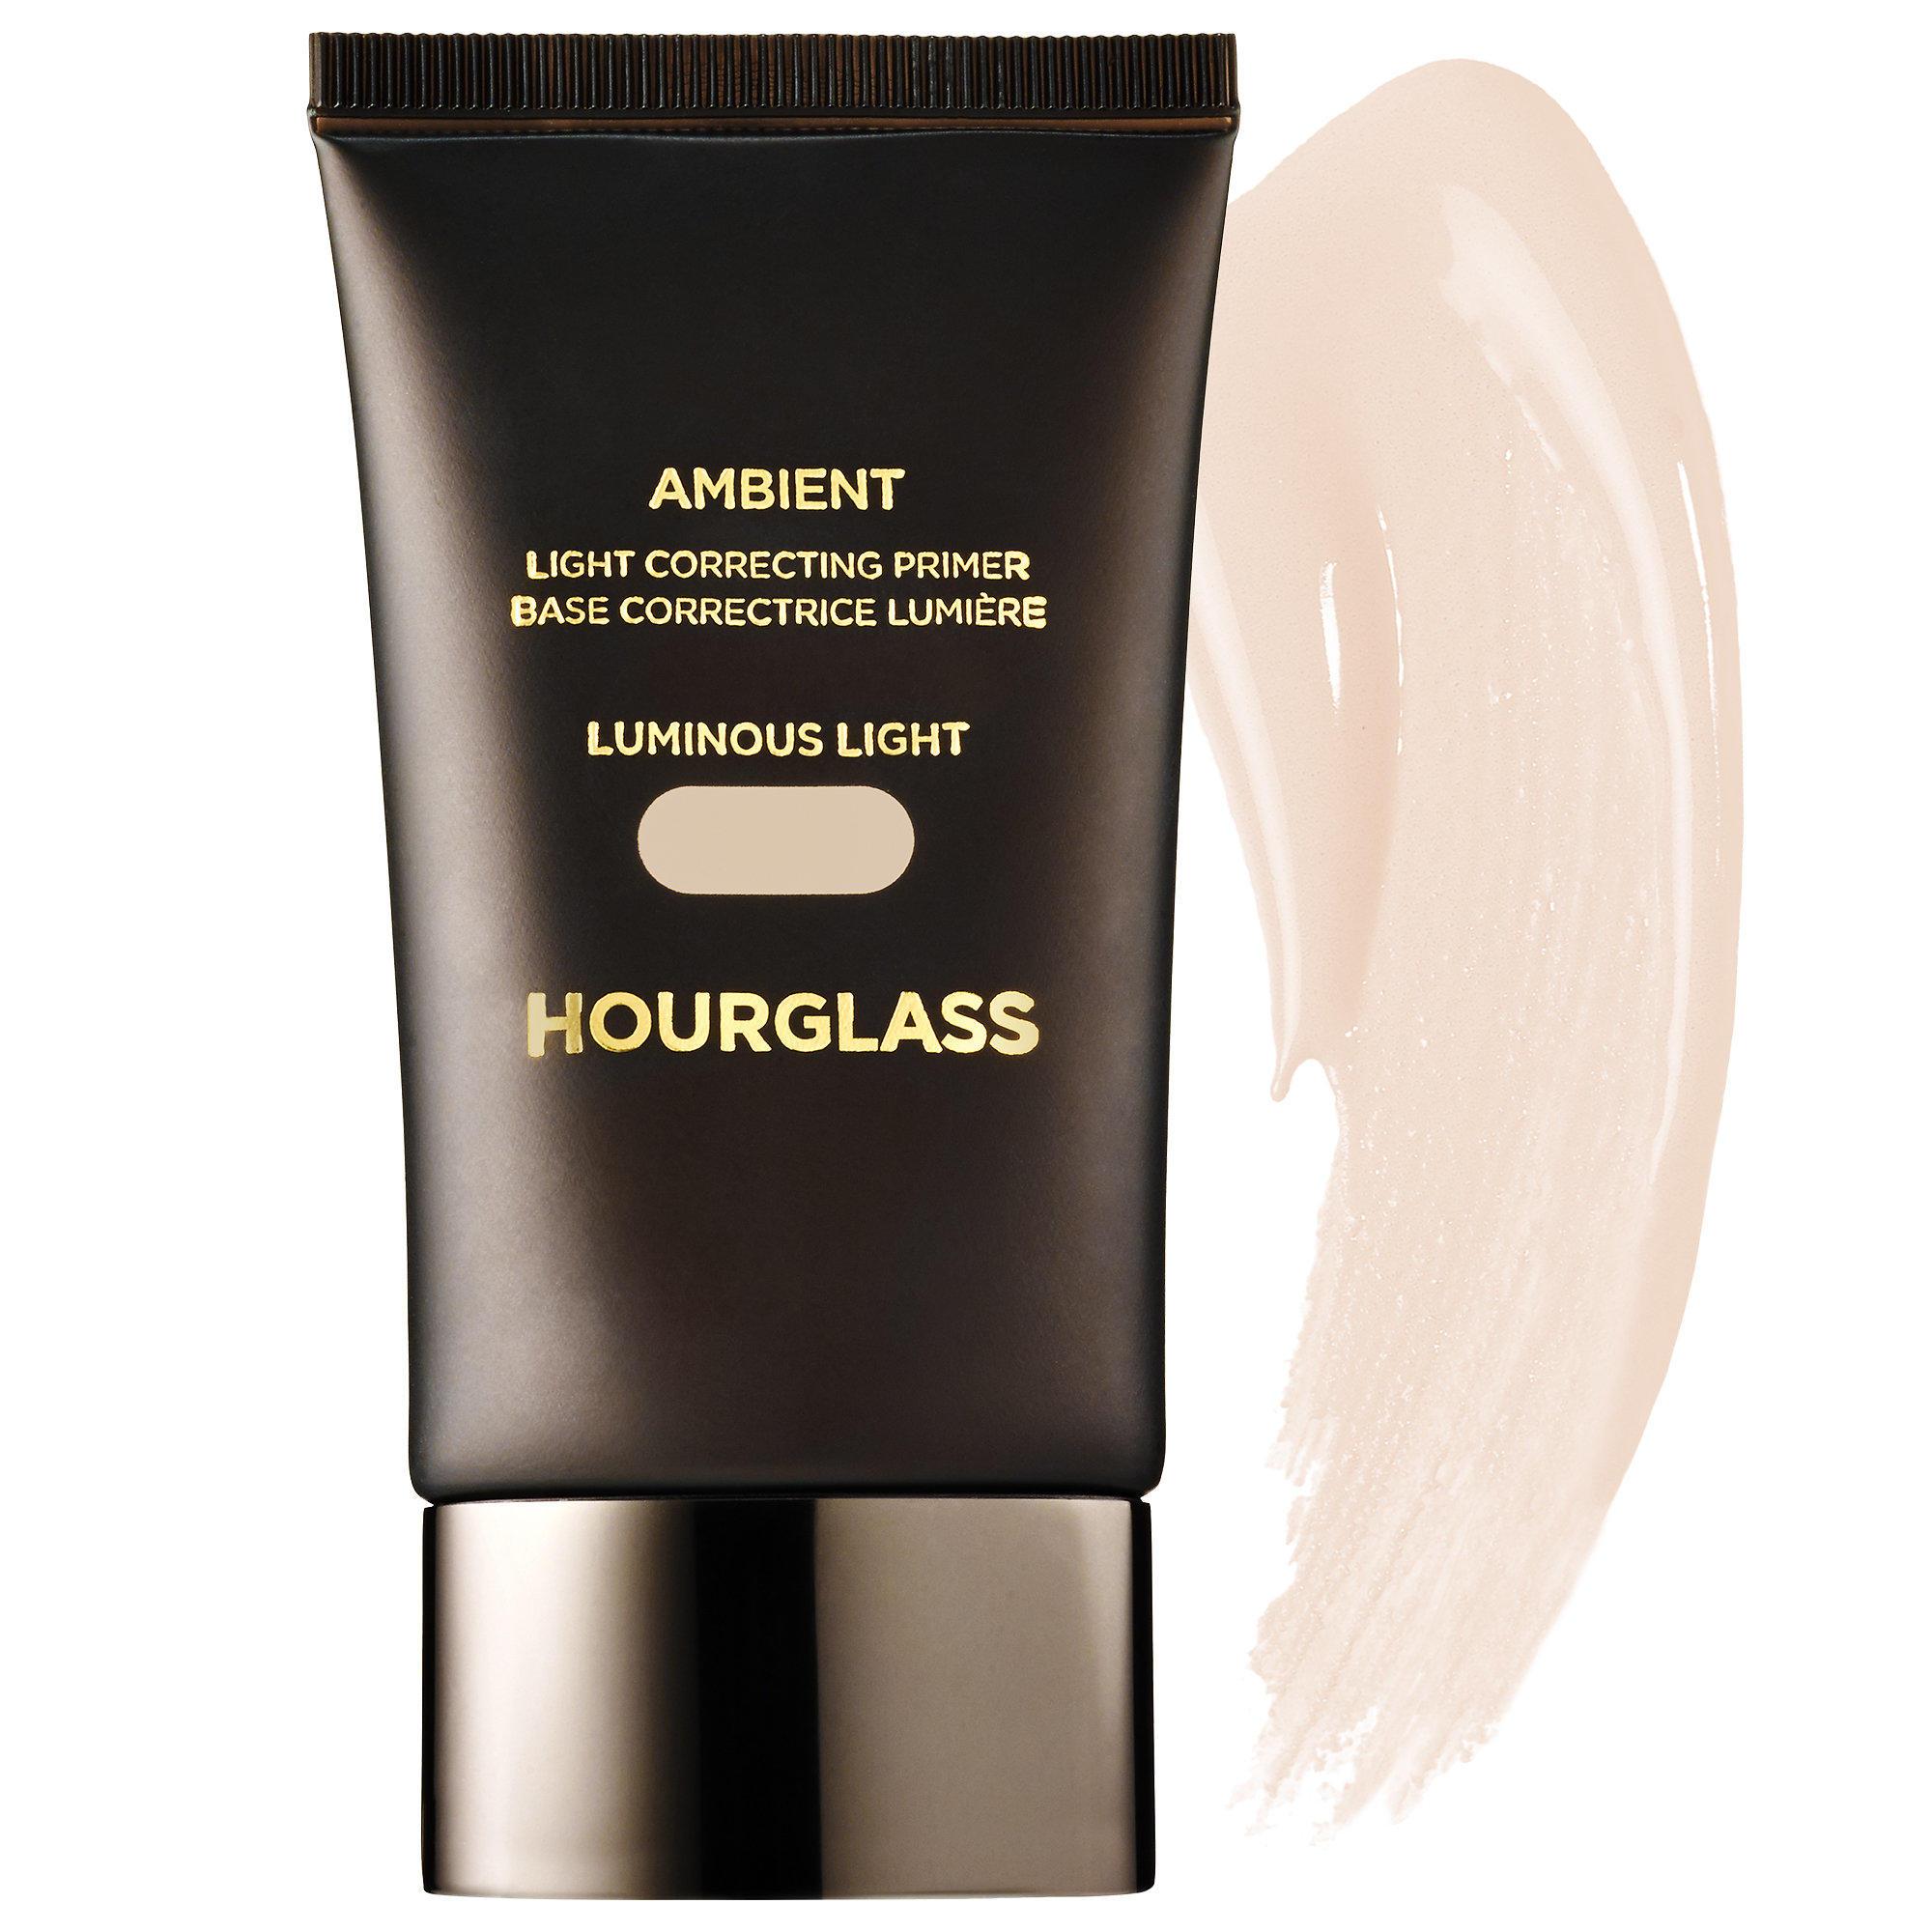 Hourglass Ambient Light Correcting Primer Luminous Light